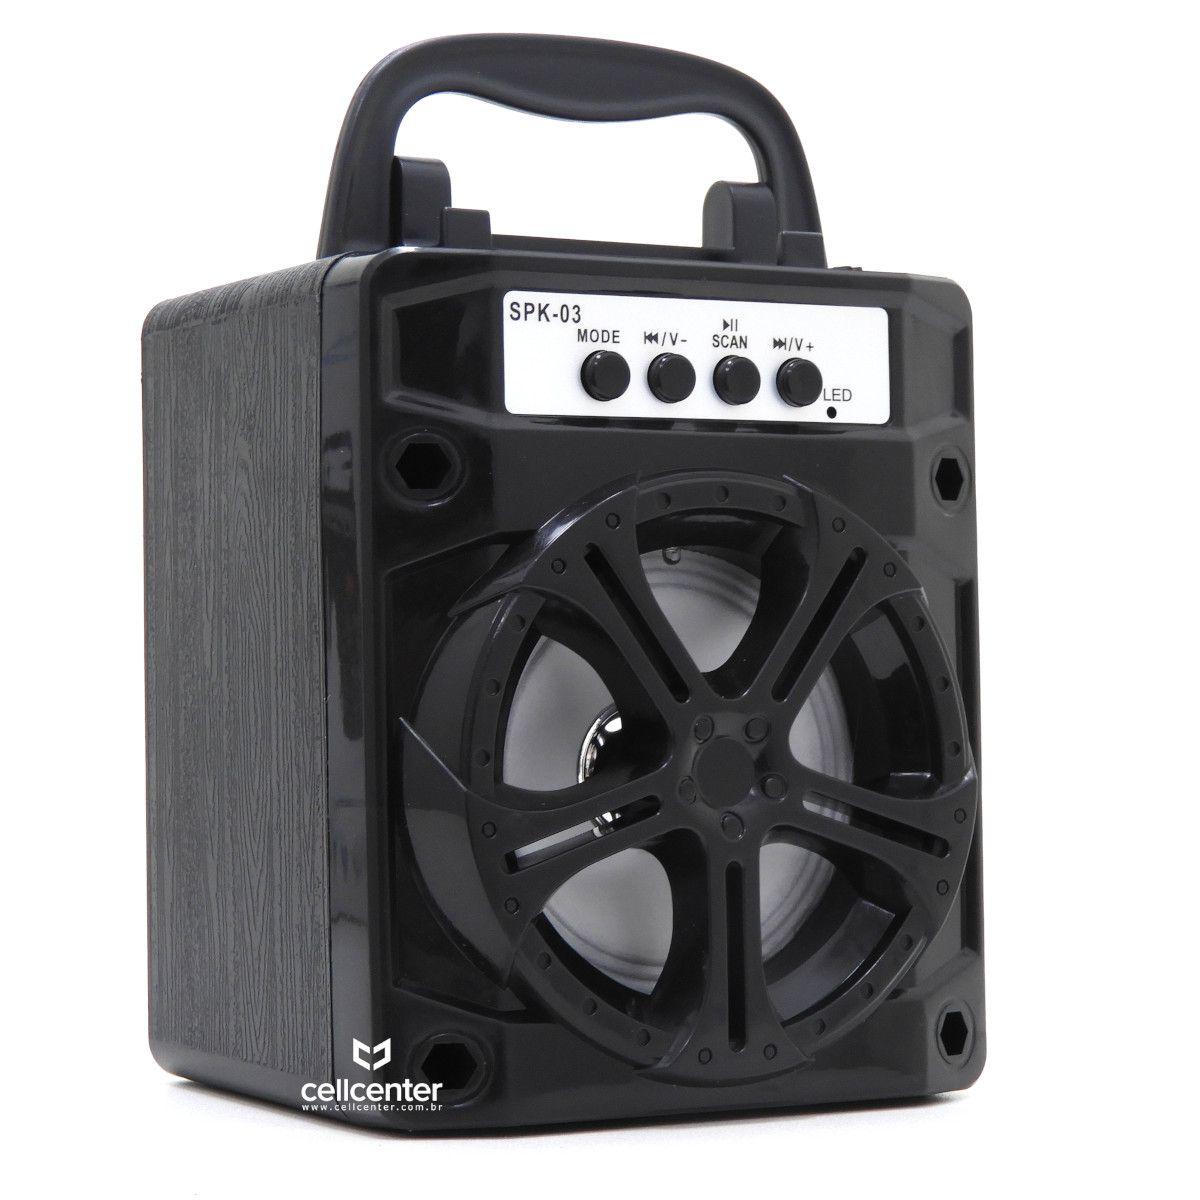 Caixa Som Bluetooth 5w Rms Usb Mp3 Fm Sd P2 SPK-03